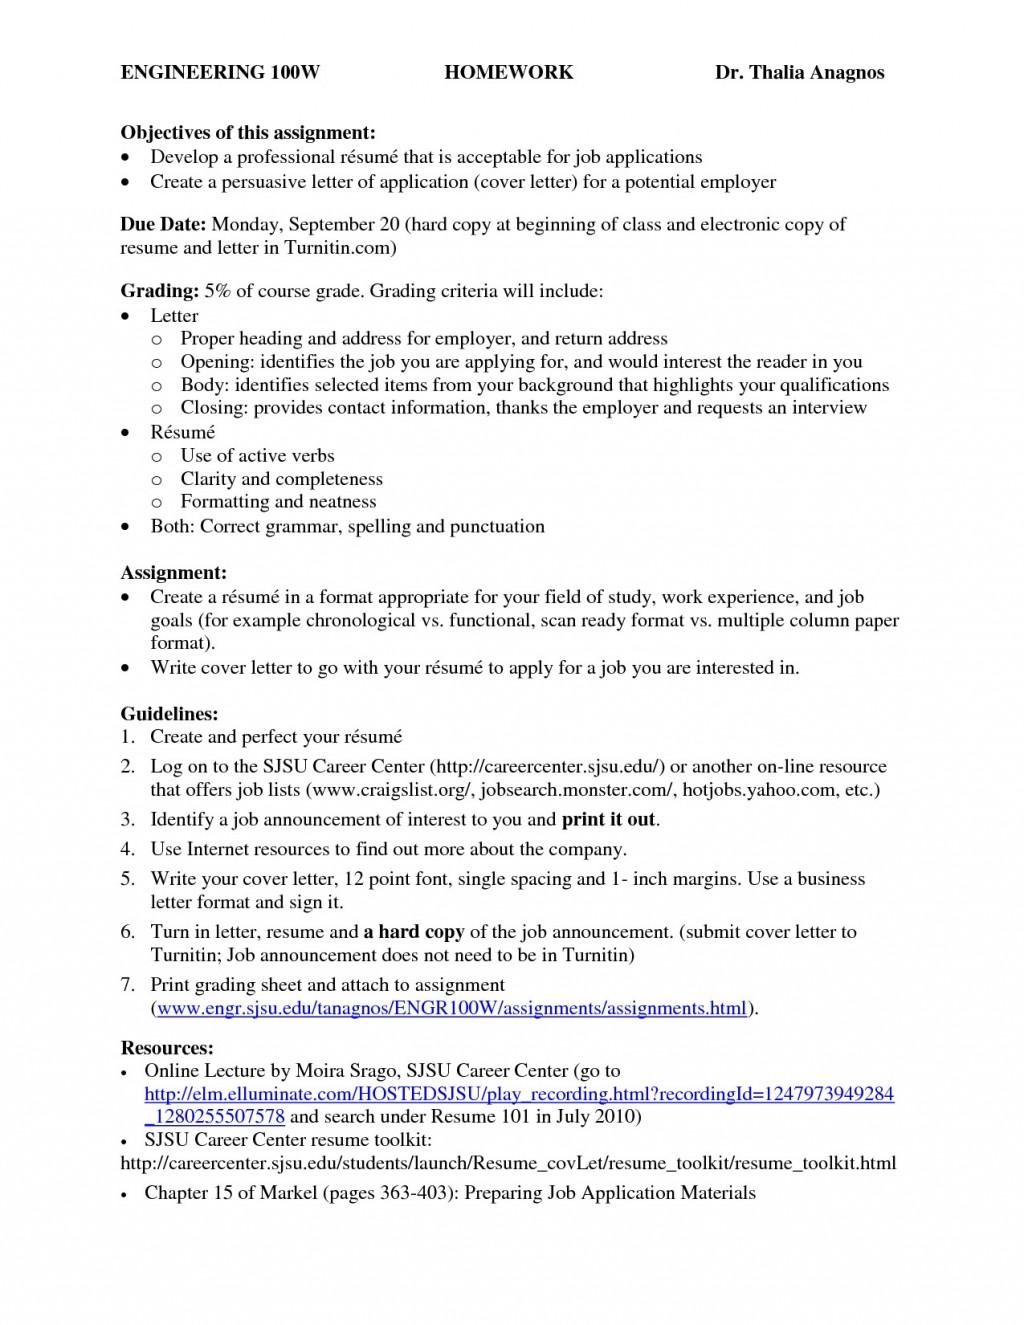 002 Resume Template Purdue Owl How Do U Write An Essay In Mla Format Beau Formal Apa Beautiful University Writing Example Paper Large